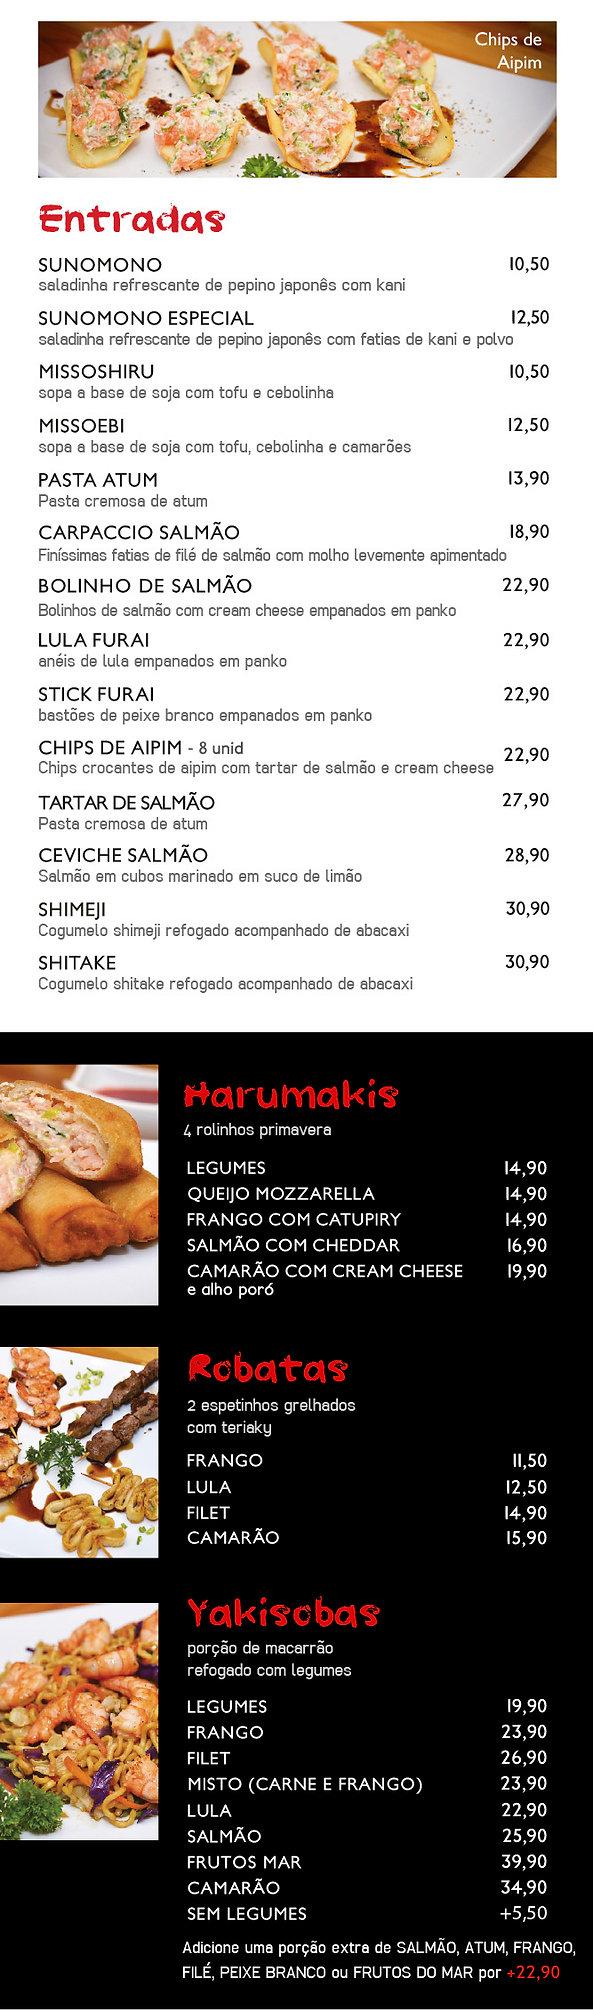 TMAKICLUB_menu_mobile_2.jpg